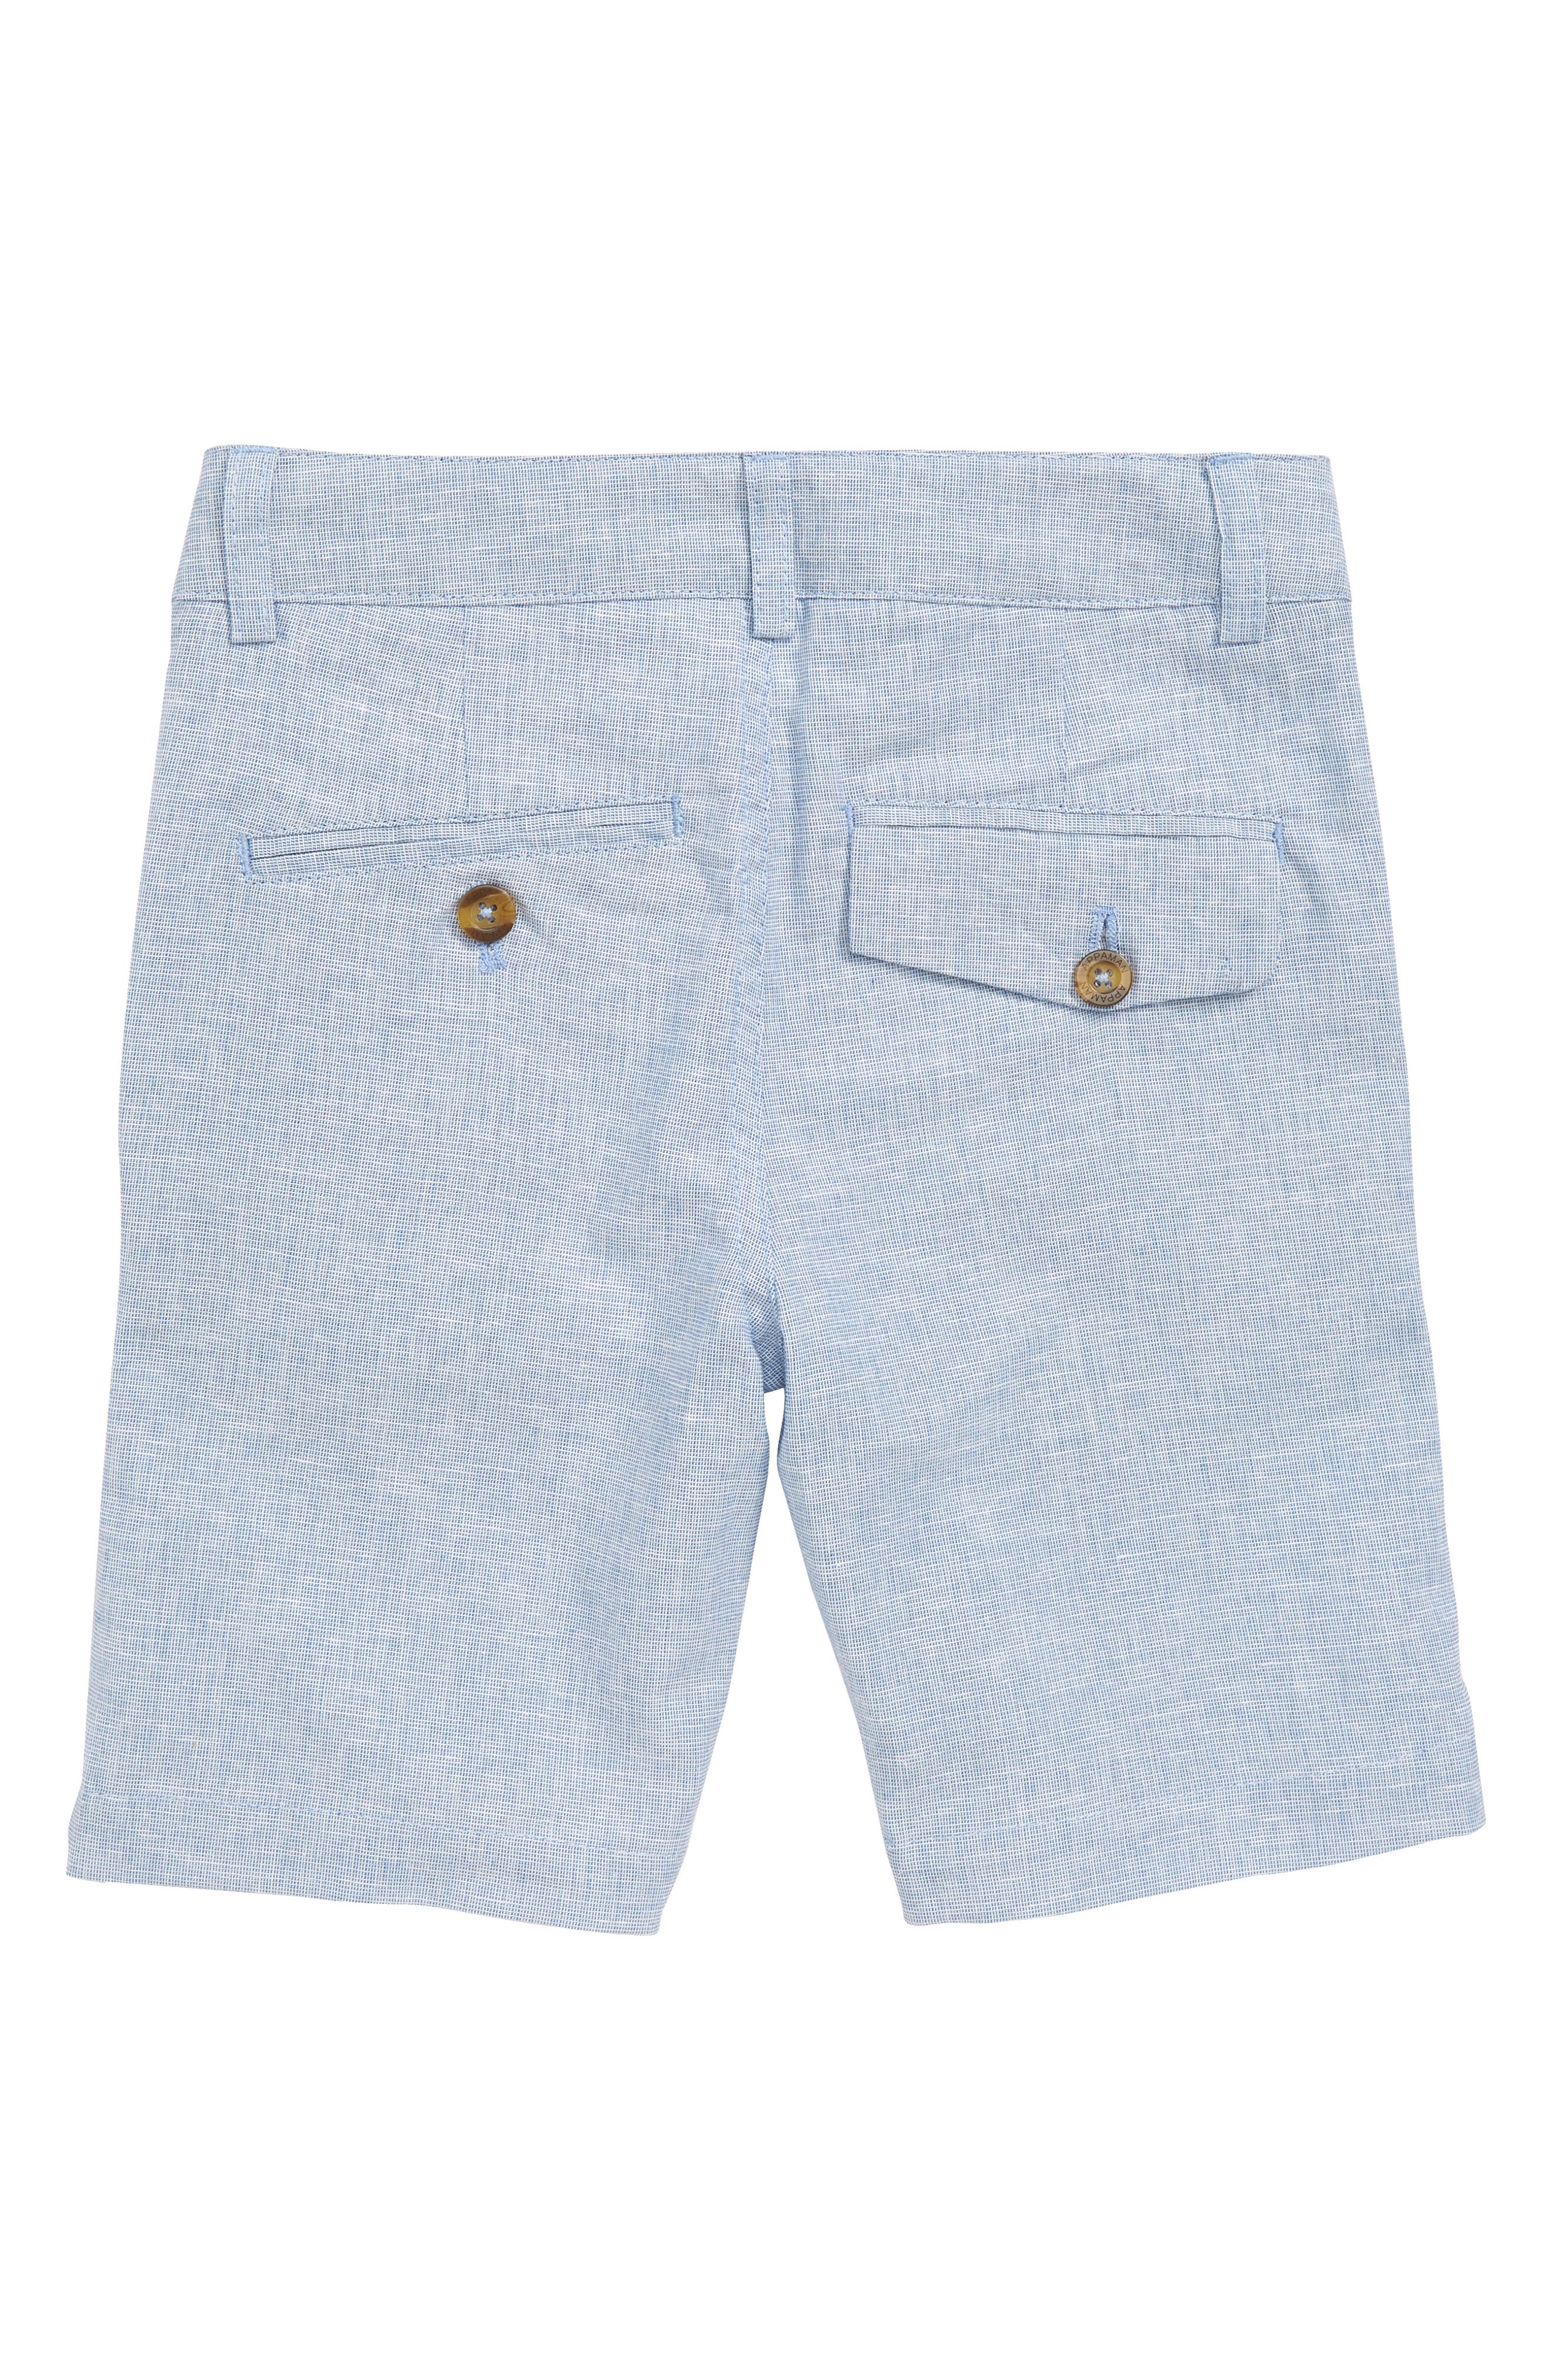 Trouser Shorts,                             Alternate thumbnail 2, color,                             459